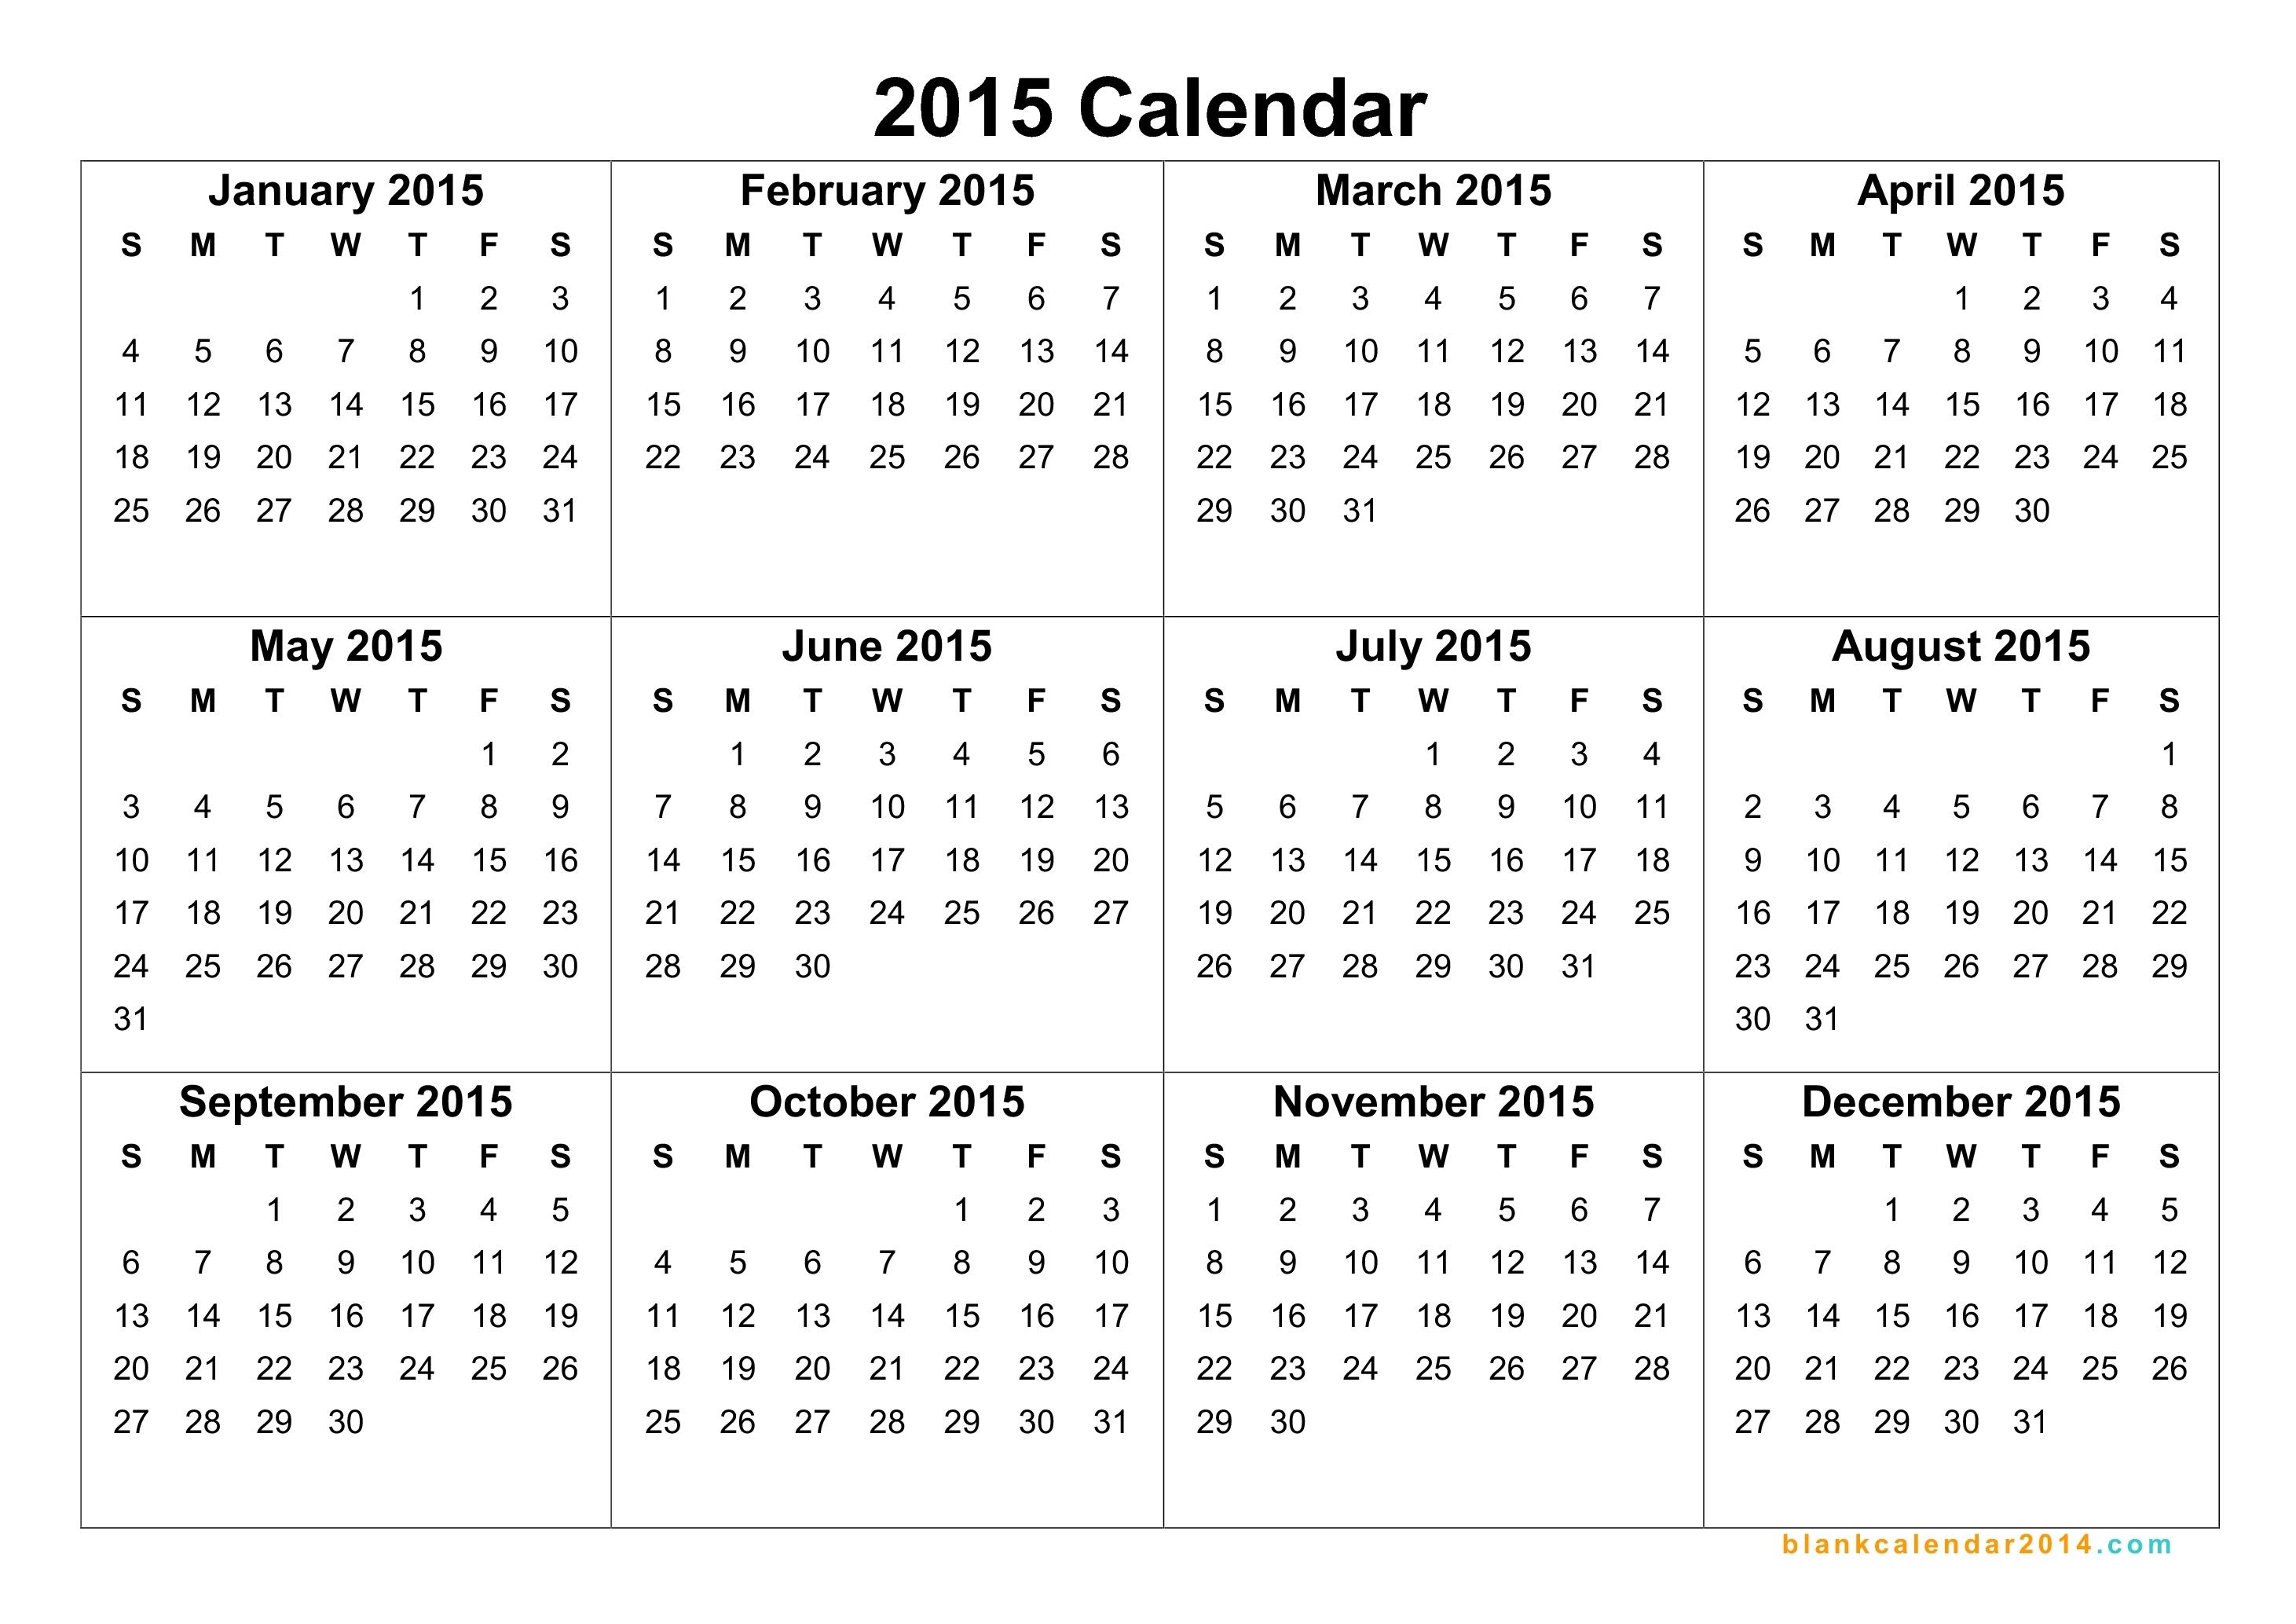 2015 Full Year Calendar Printable - Maco.palmex.co for 12 Months Printable Calendar Whole